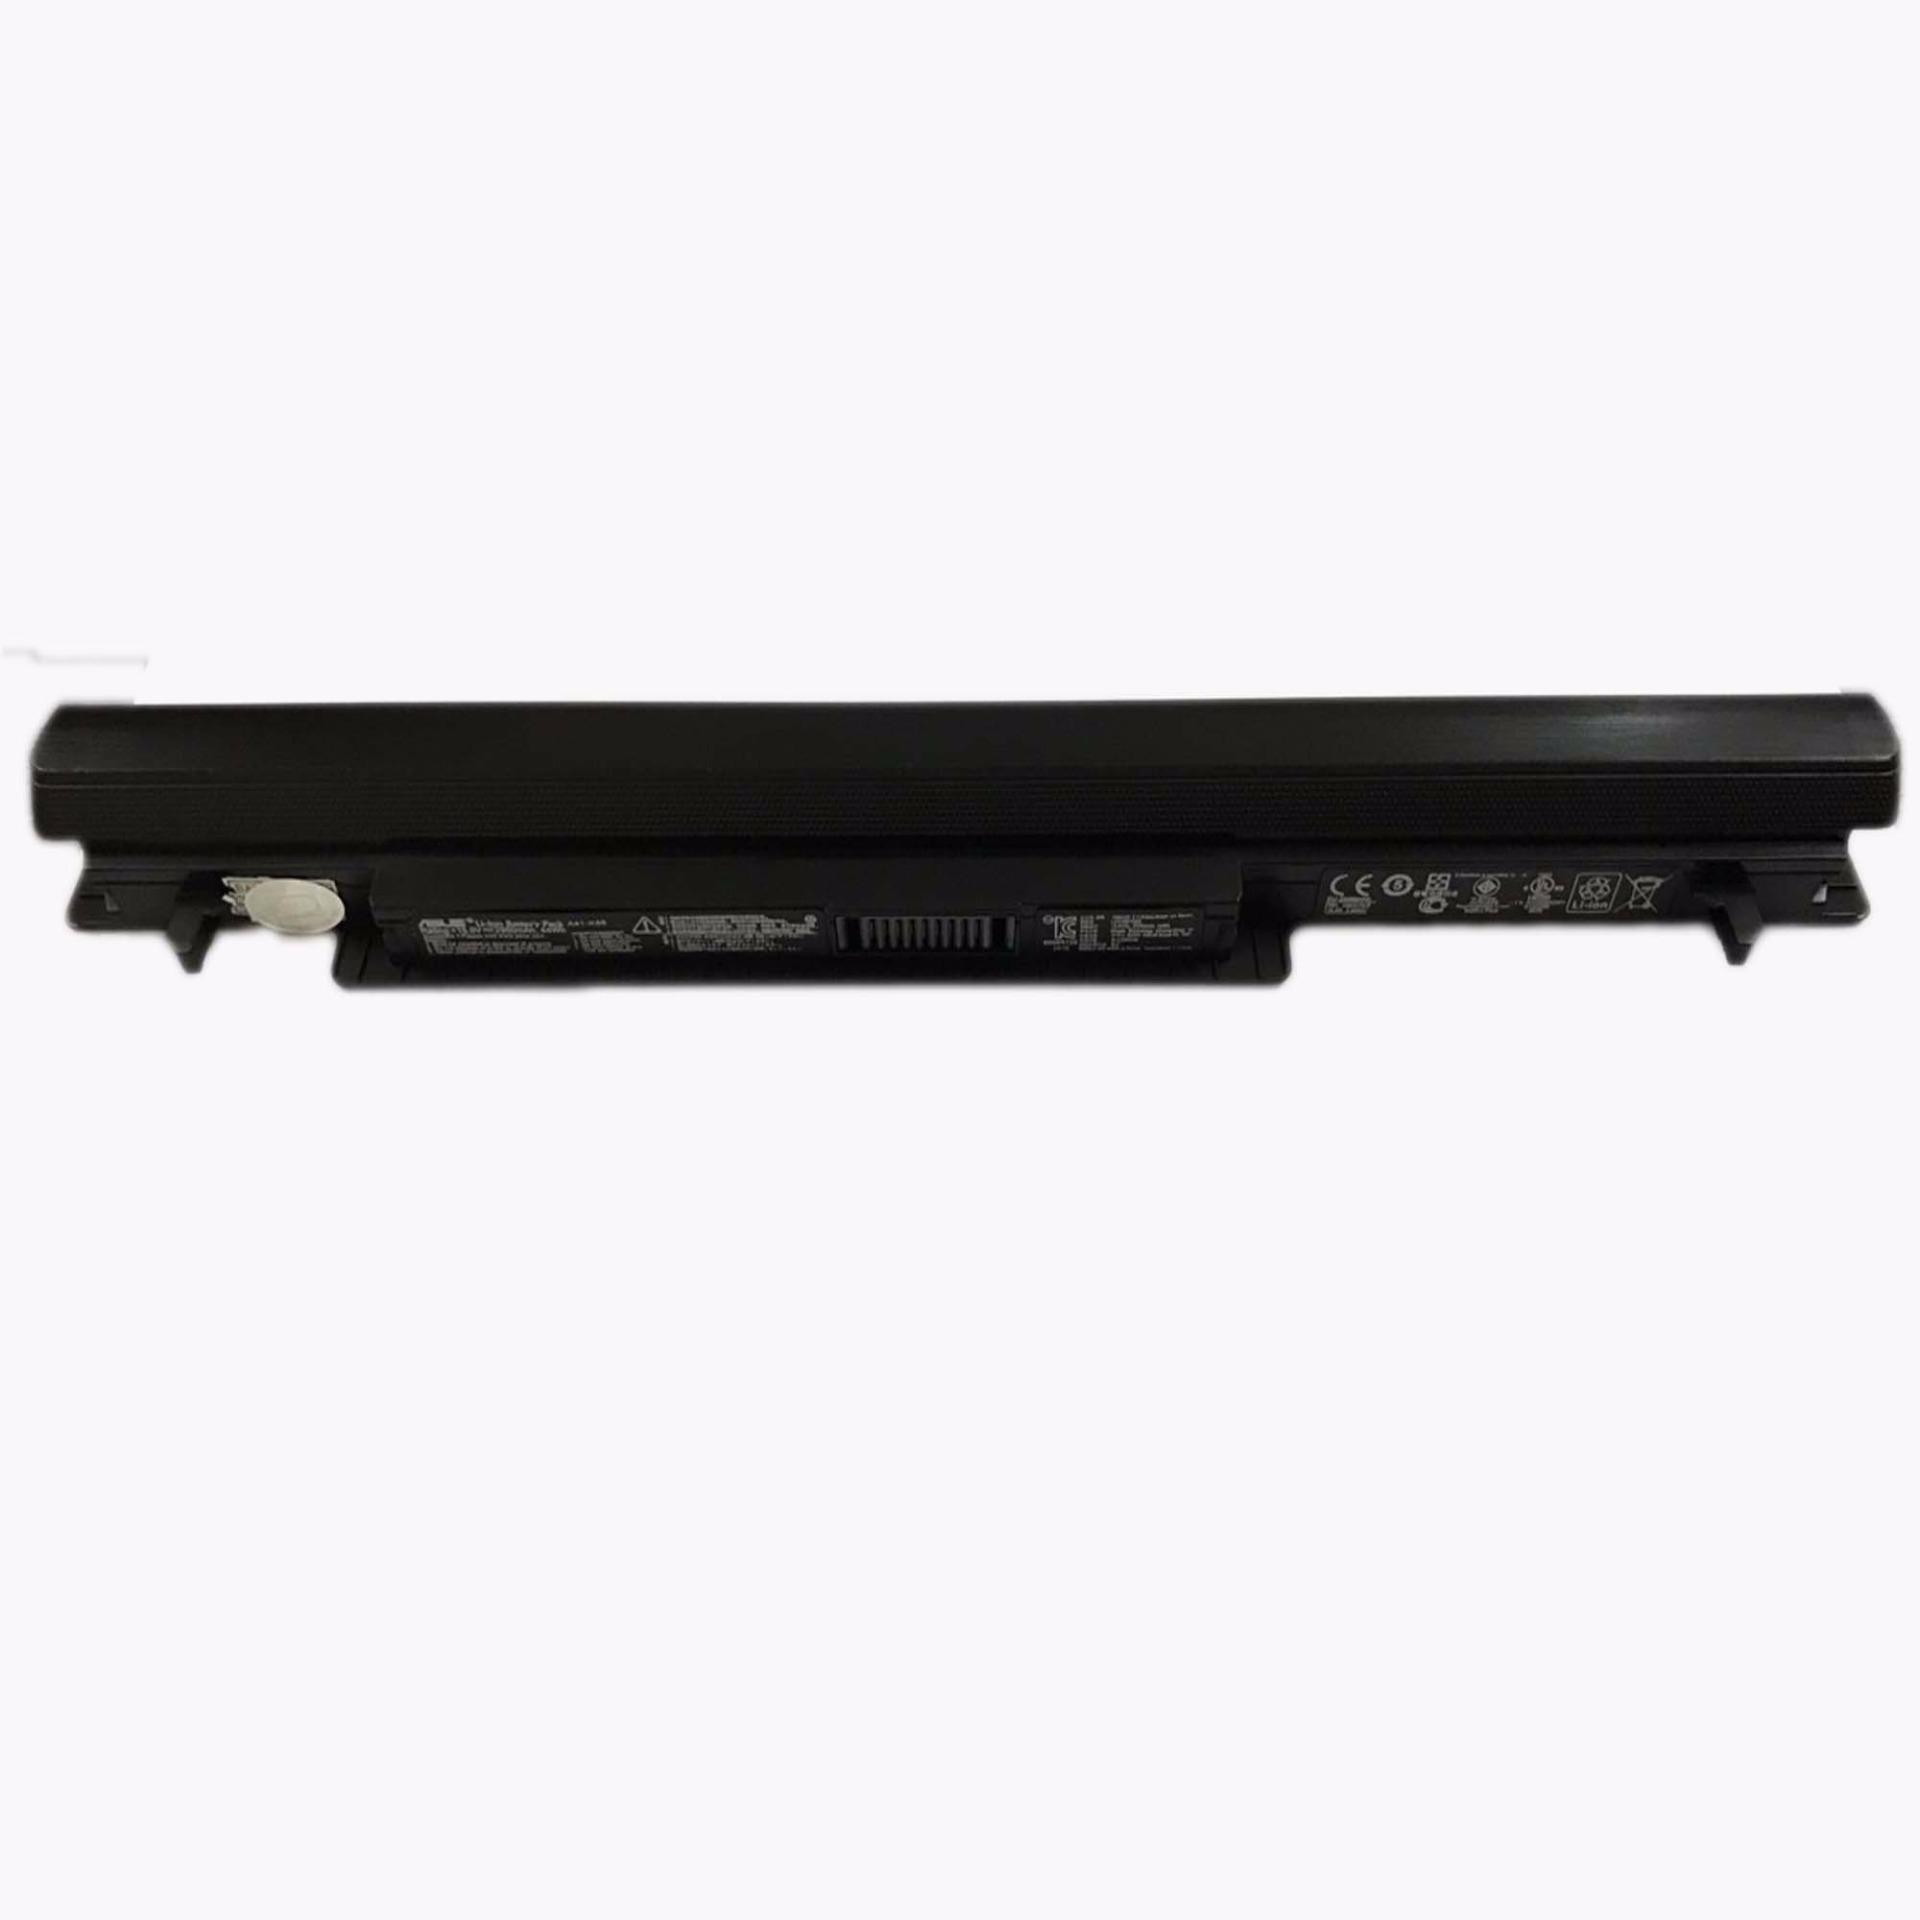 Pin Laptop Asus A56C A56CA A56CM K46 K46C K46CA K46CM K56 K56C K56CA K56CM S46 S46C S46CA S46CM S56 S56C...